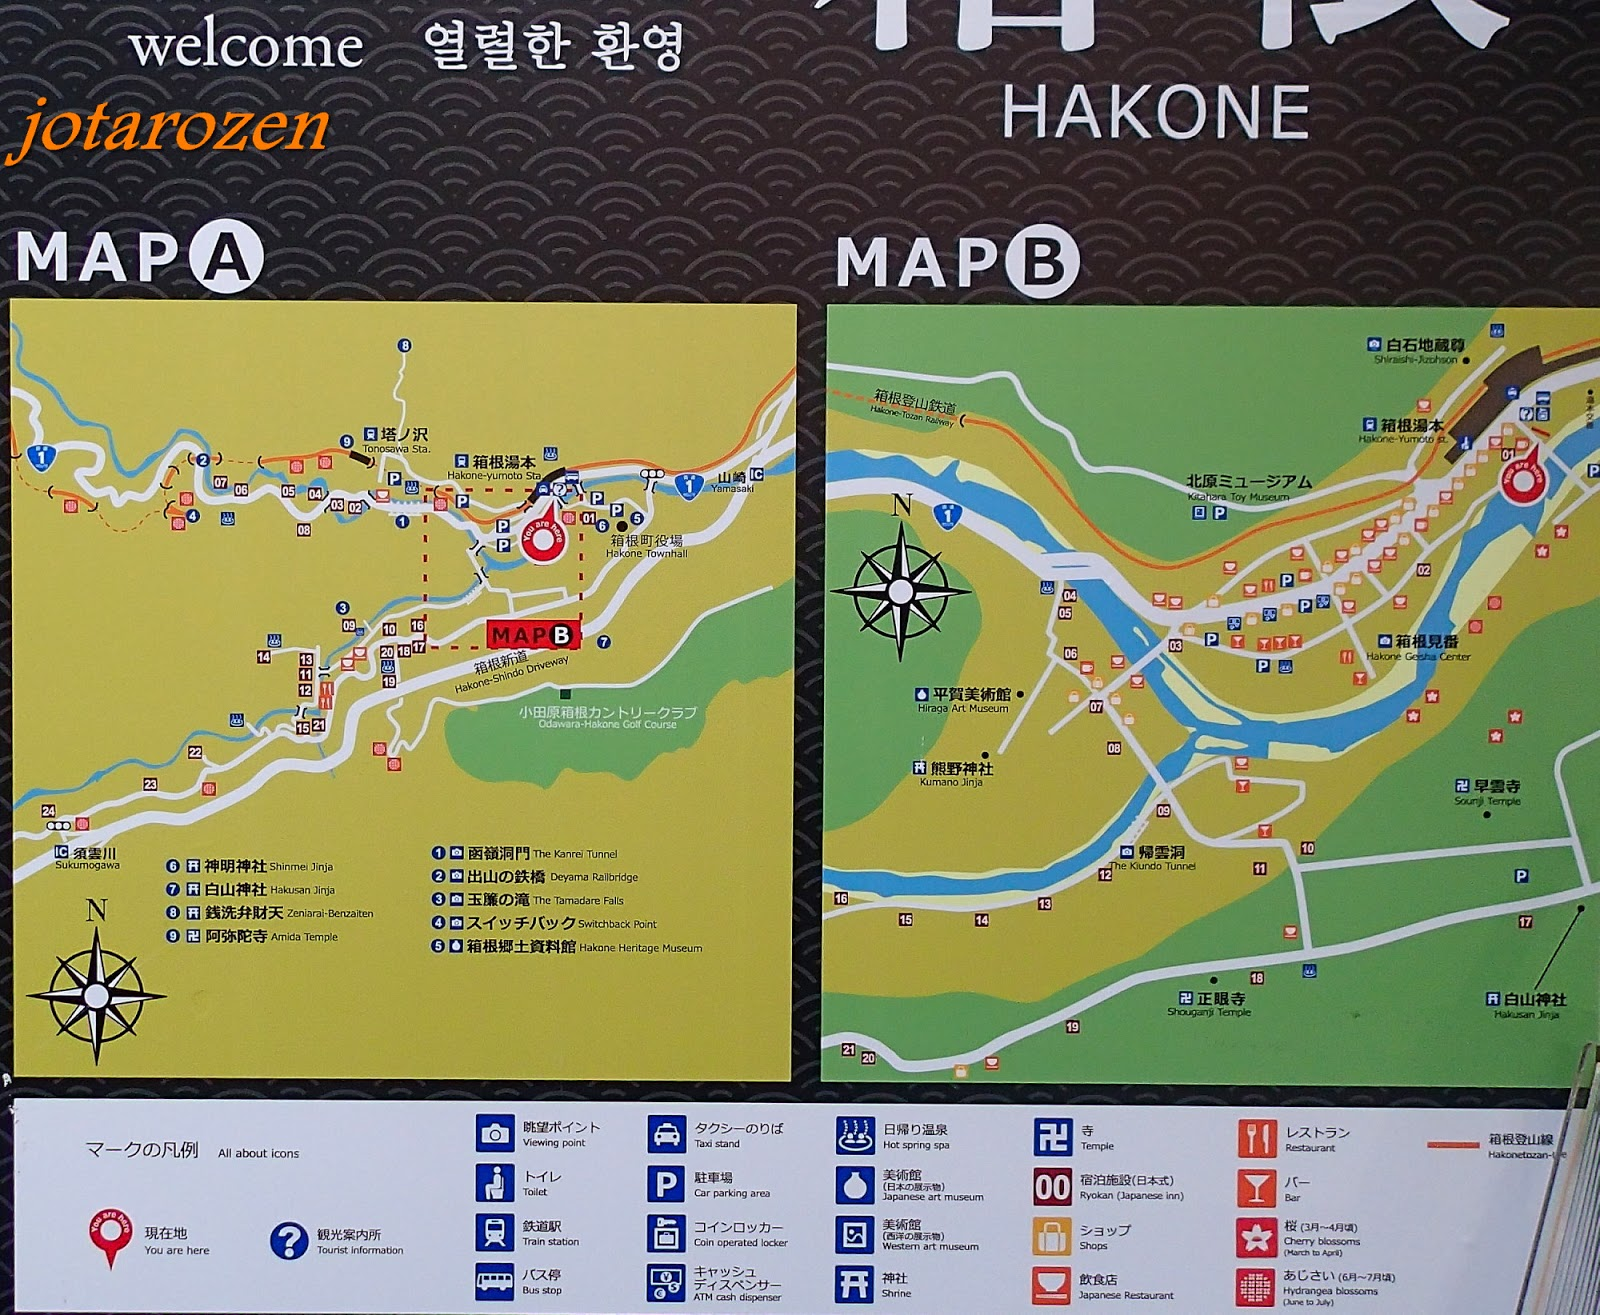 Hakone Travel Guide Pdf